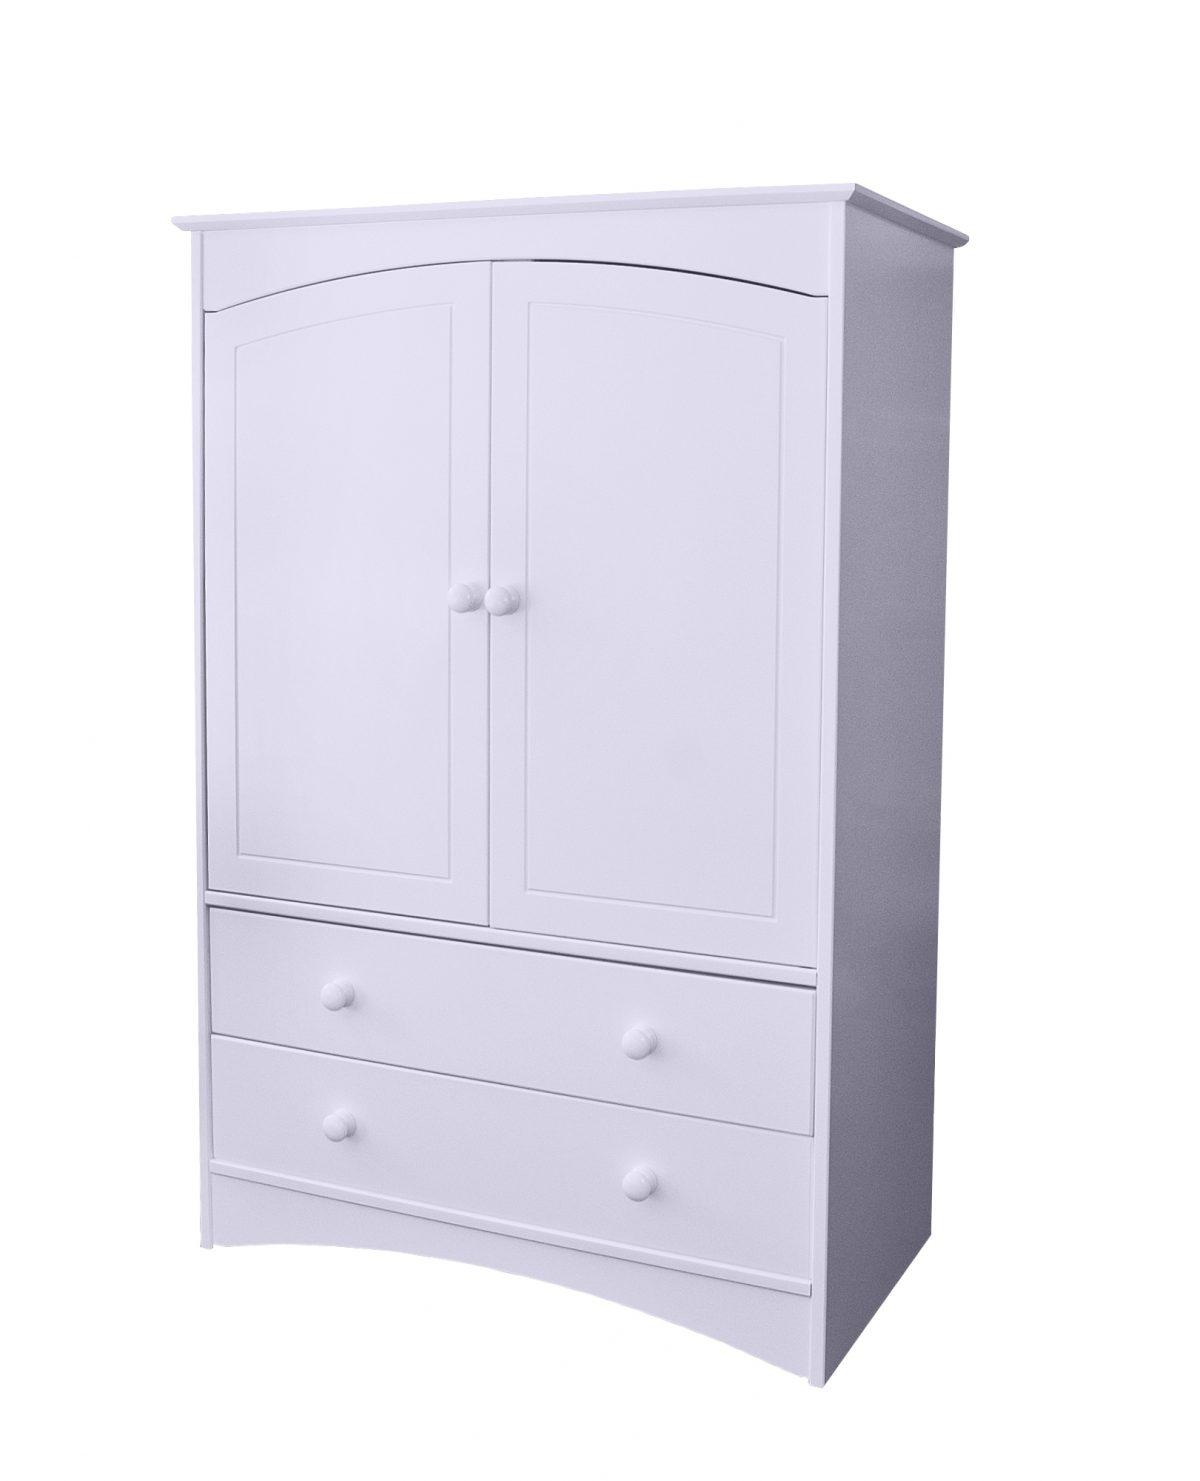 Elfin Small 2 Drawer Wardrobe Lavender Hill